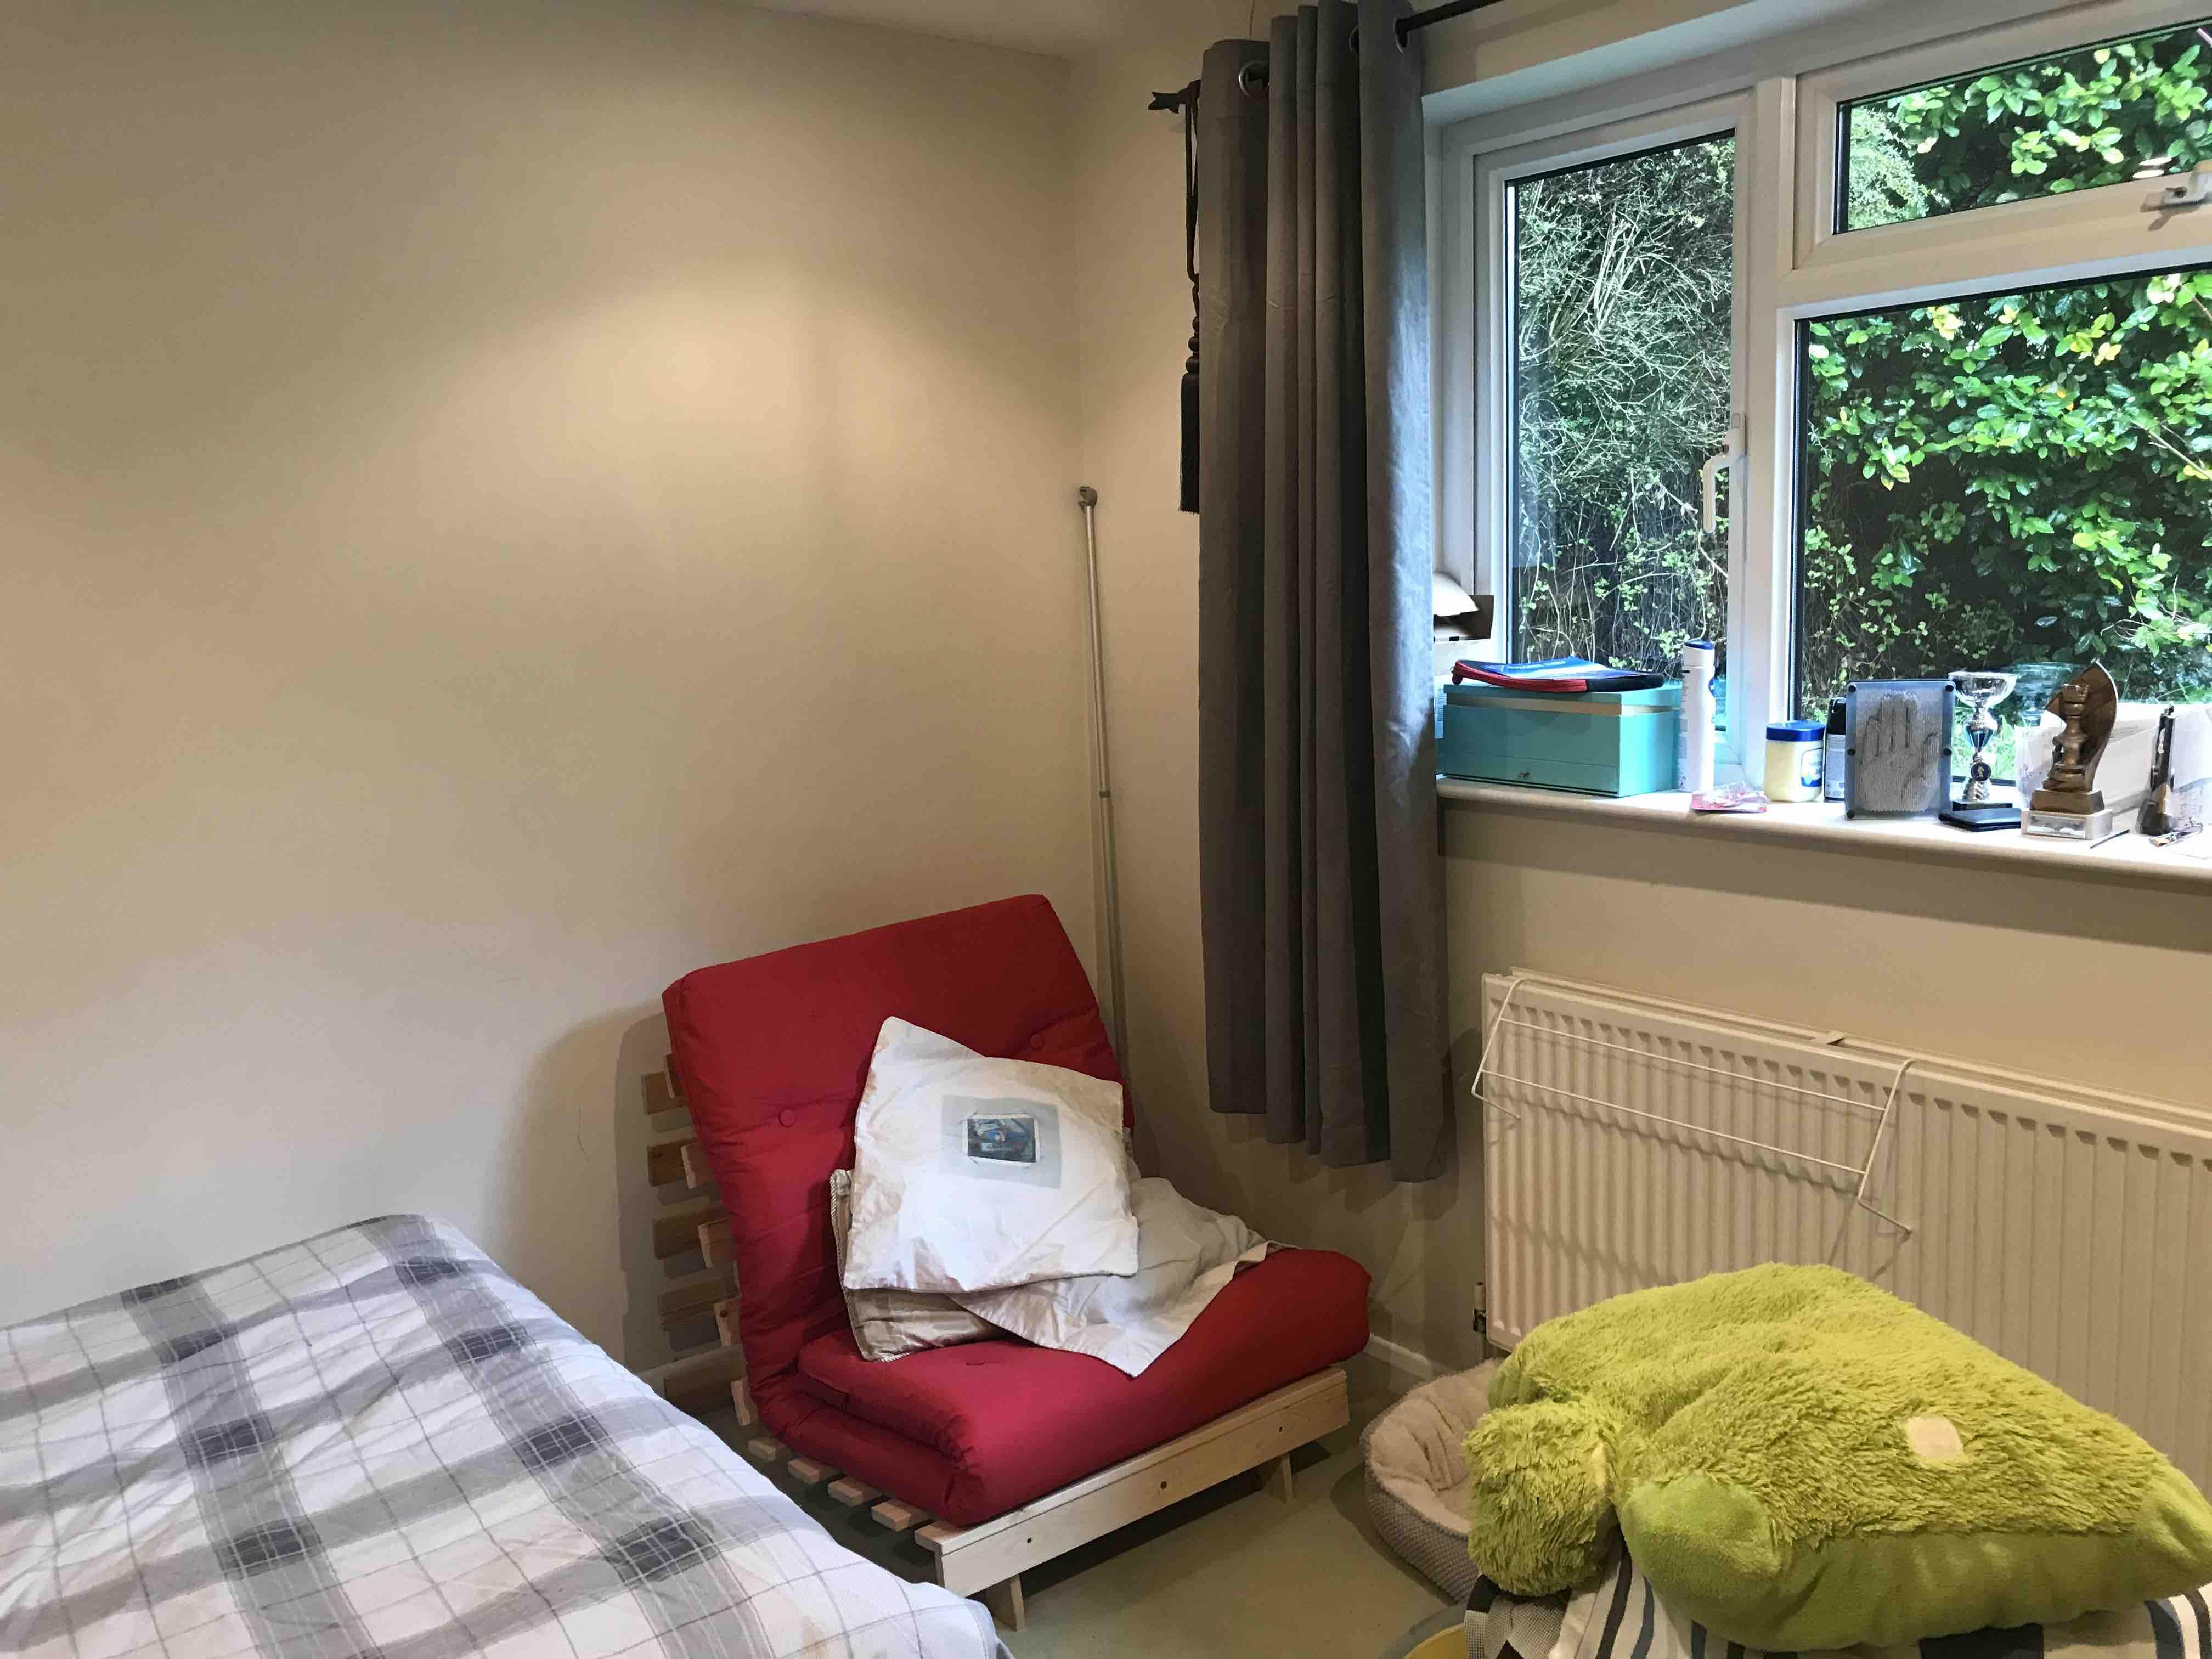 2 rooms in Batheaston, Bath, BA17JW RoomsLocal image